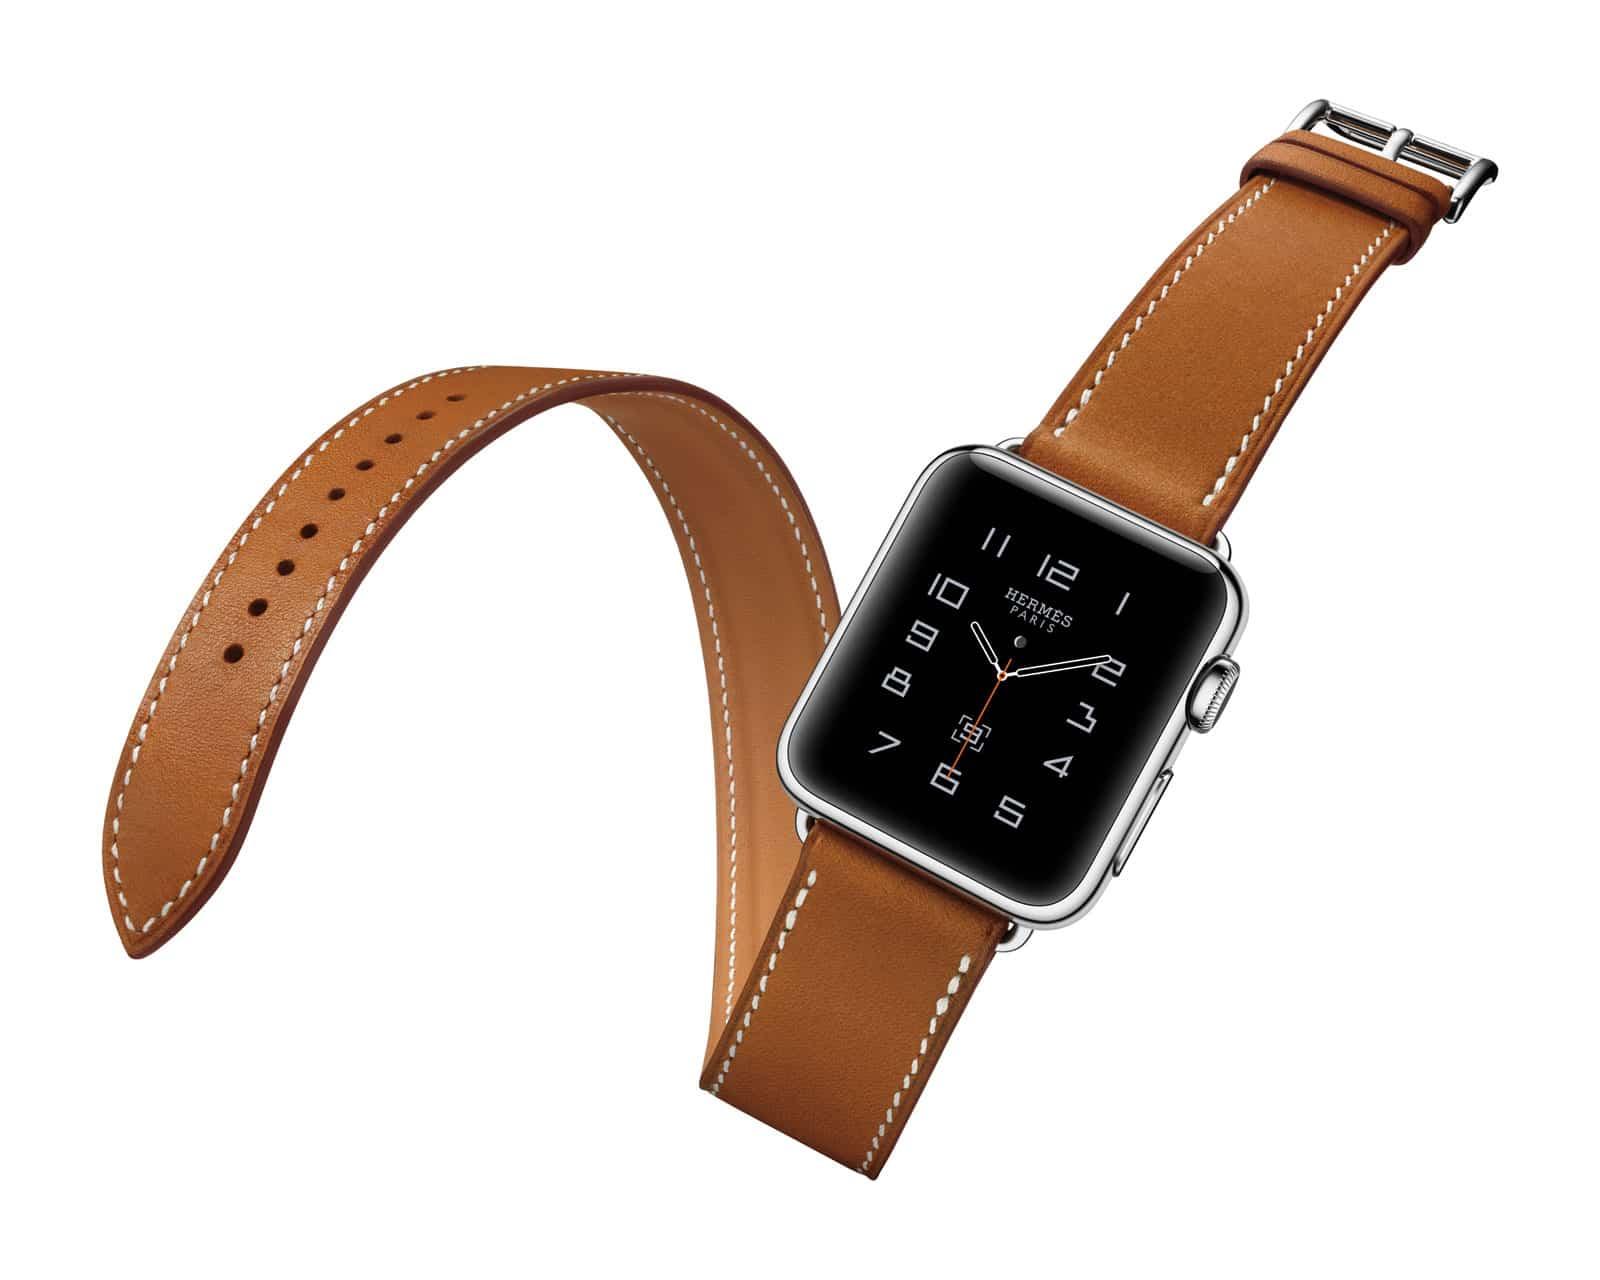 AppleWatch Hermes correa DoubleTour